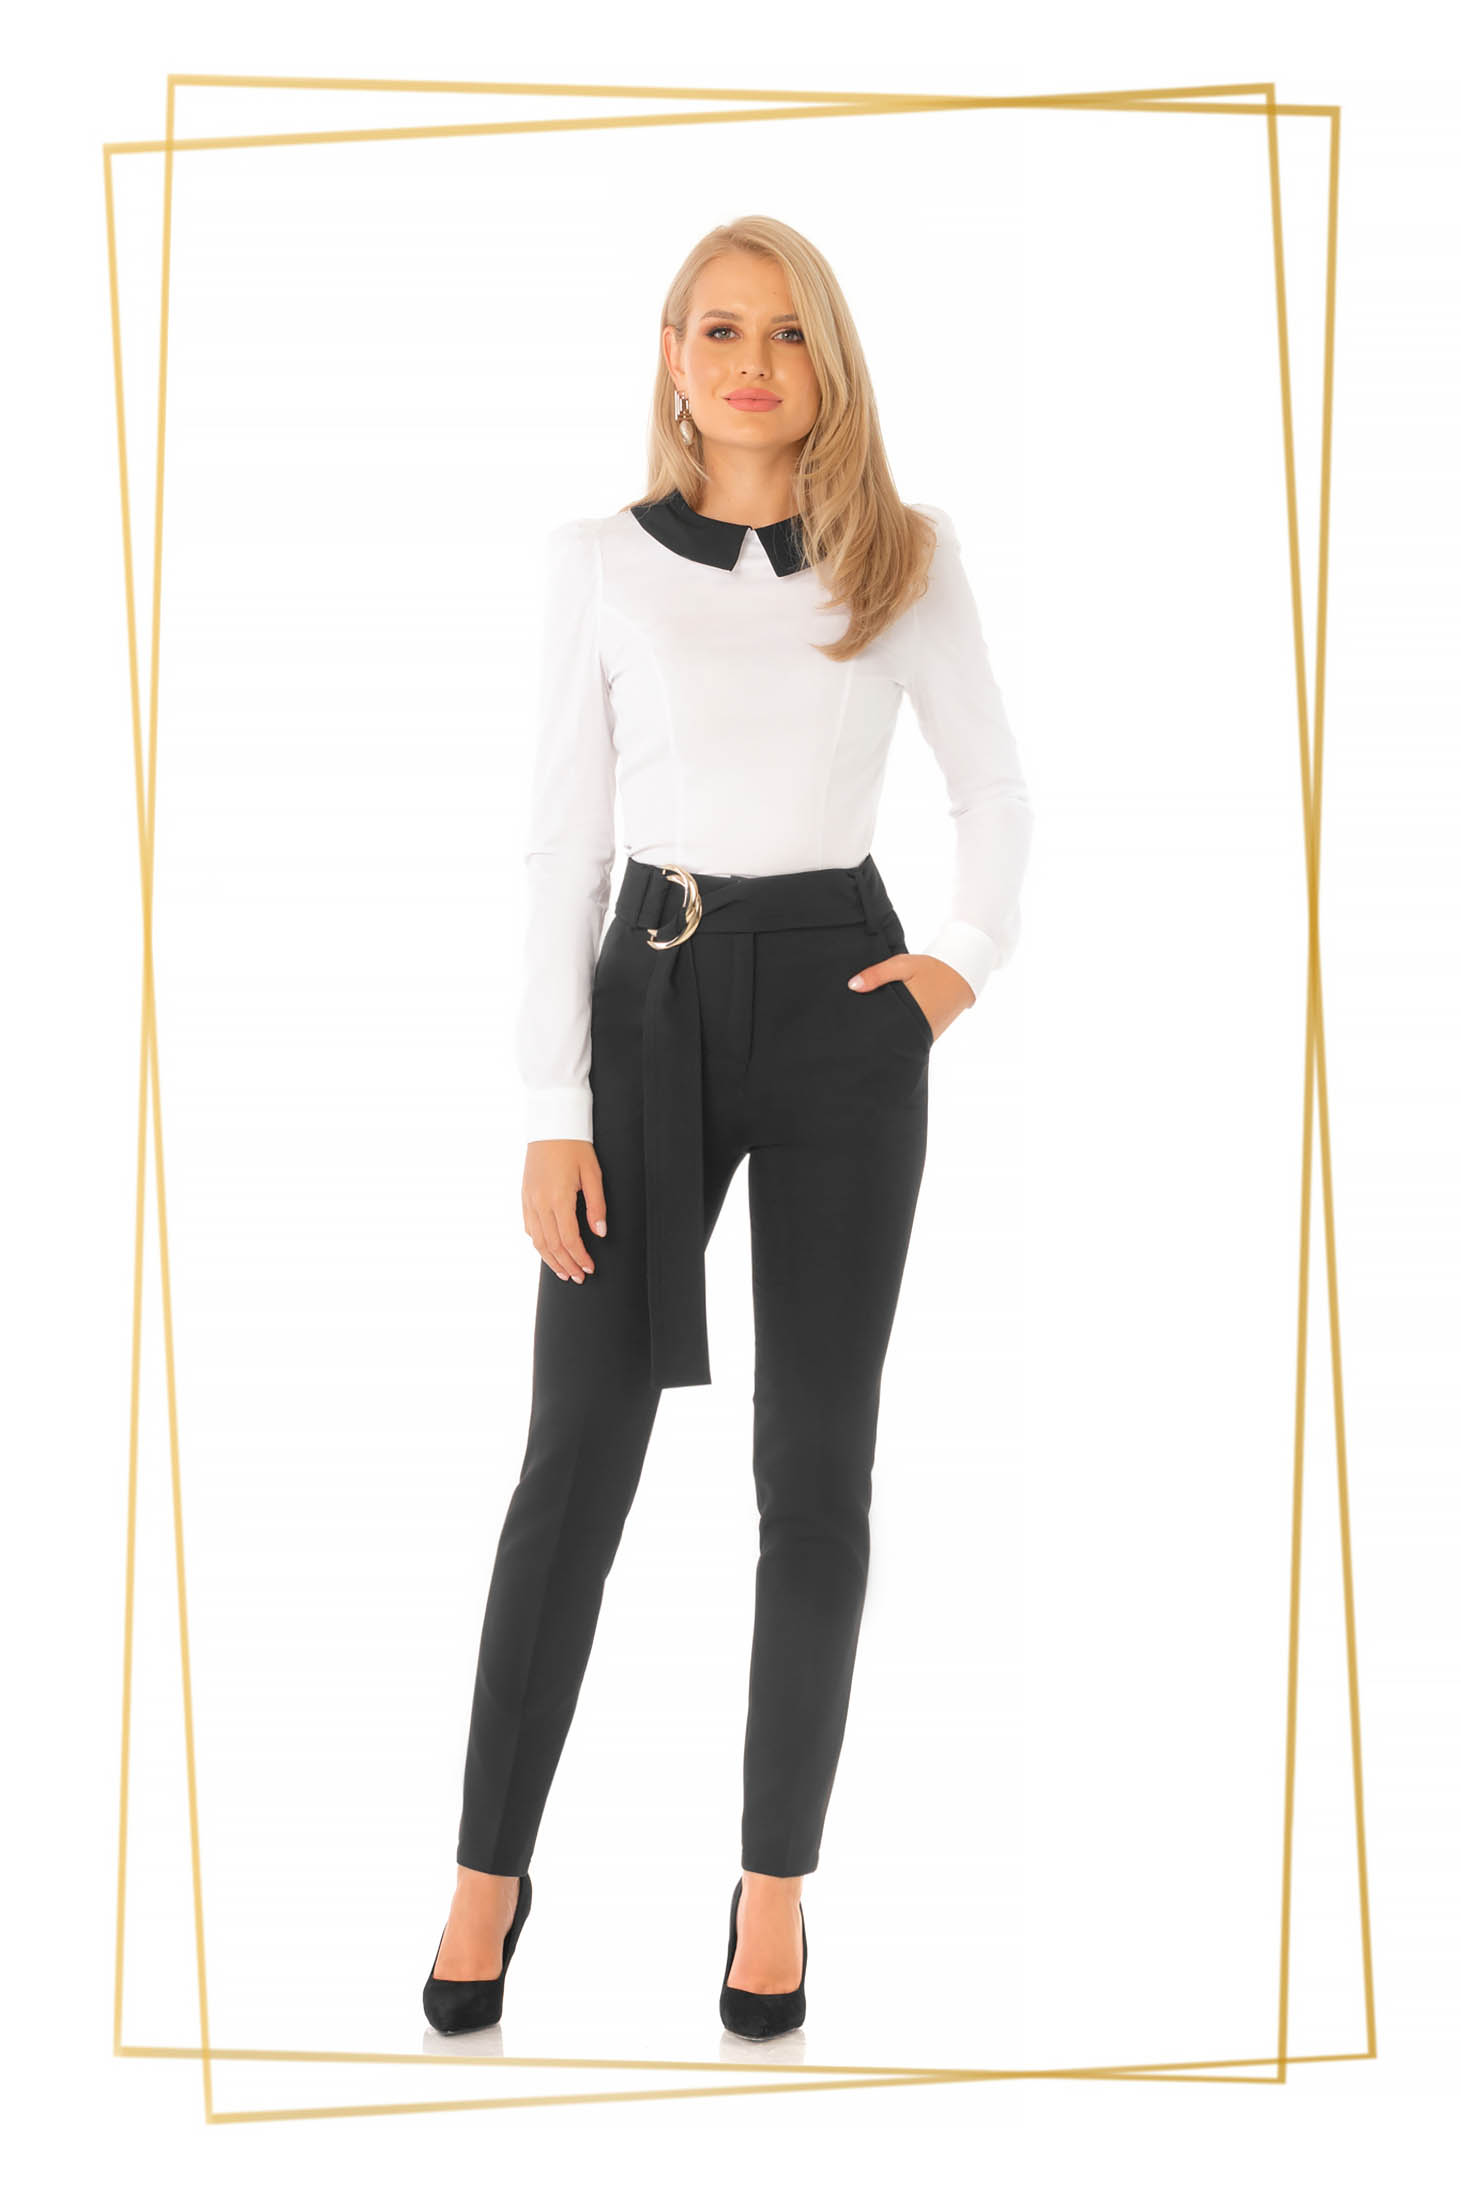 Trousers black elegant conical high waisted slightly elastic fabric